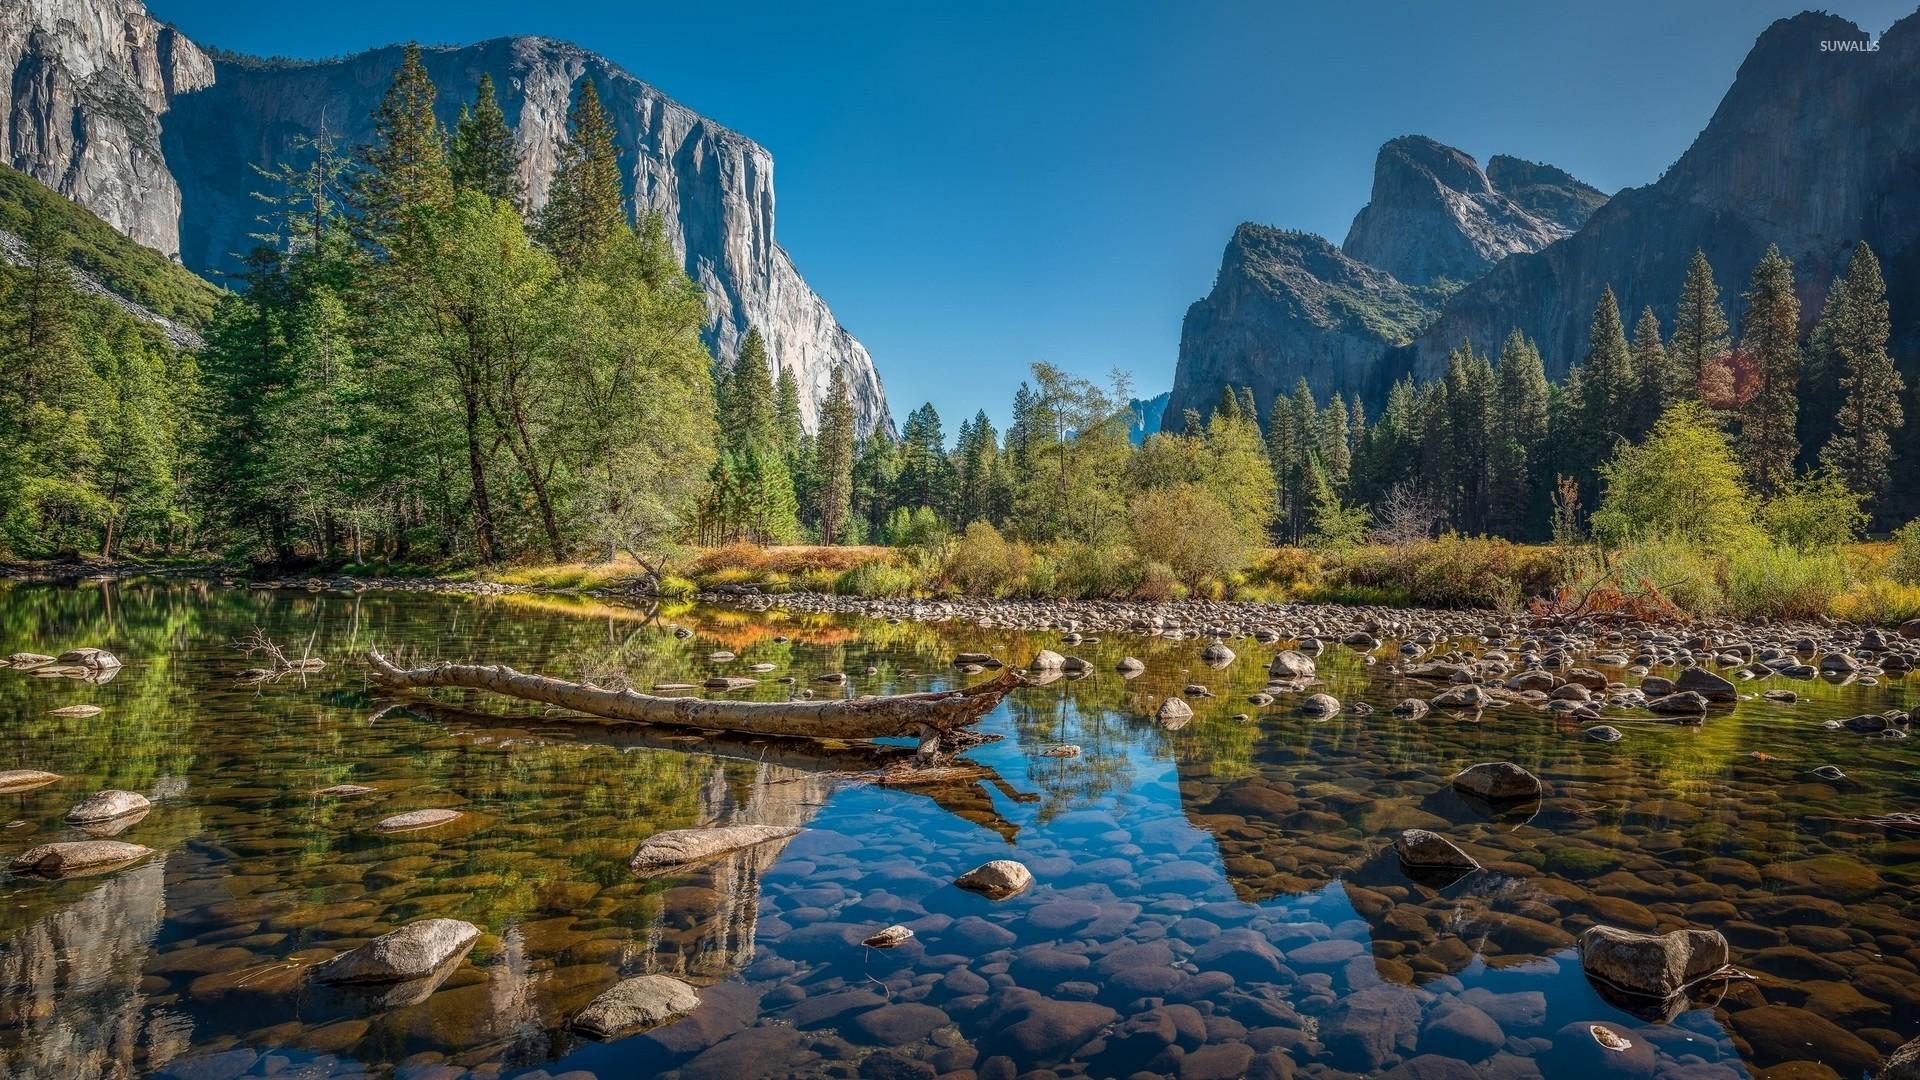 Yosemite National Park Wallpaper Hd 58 Images